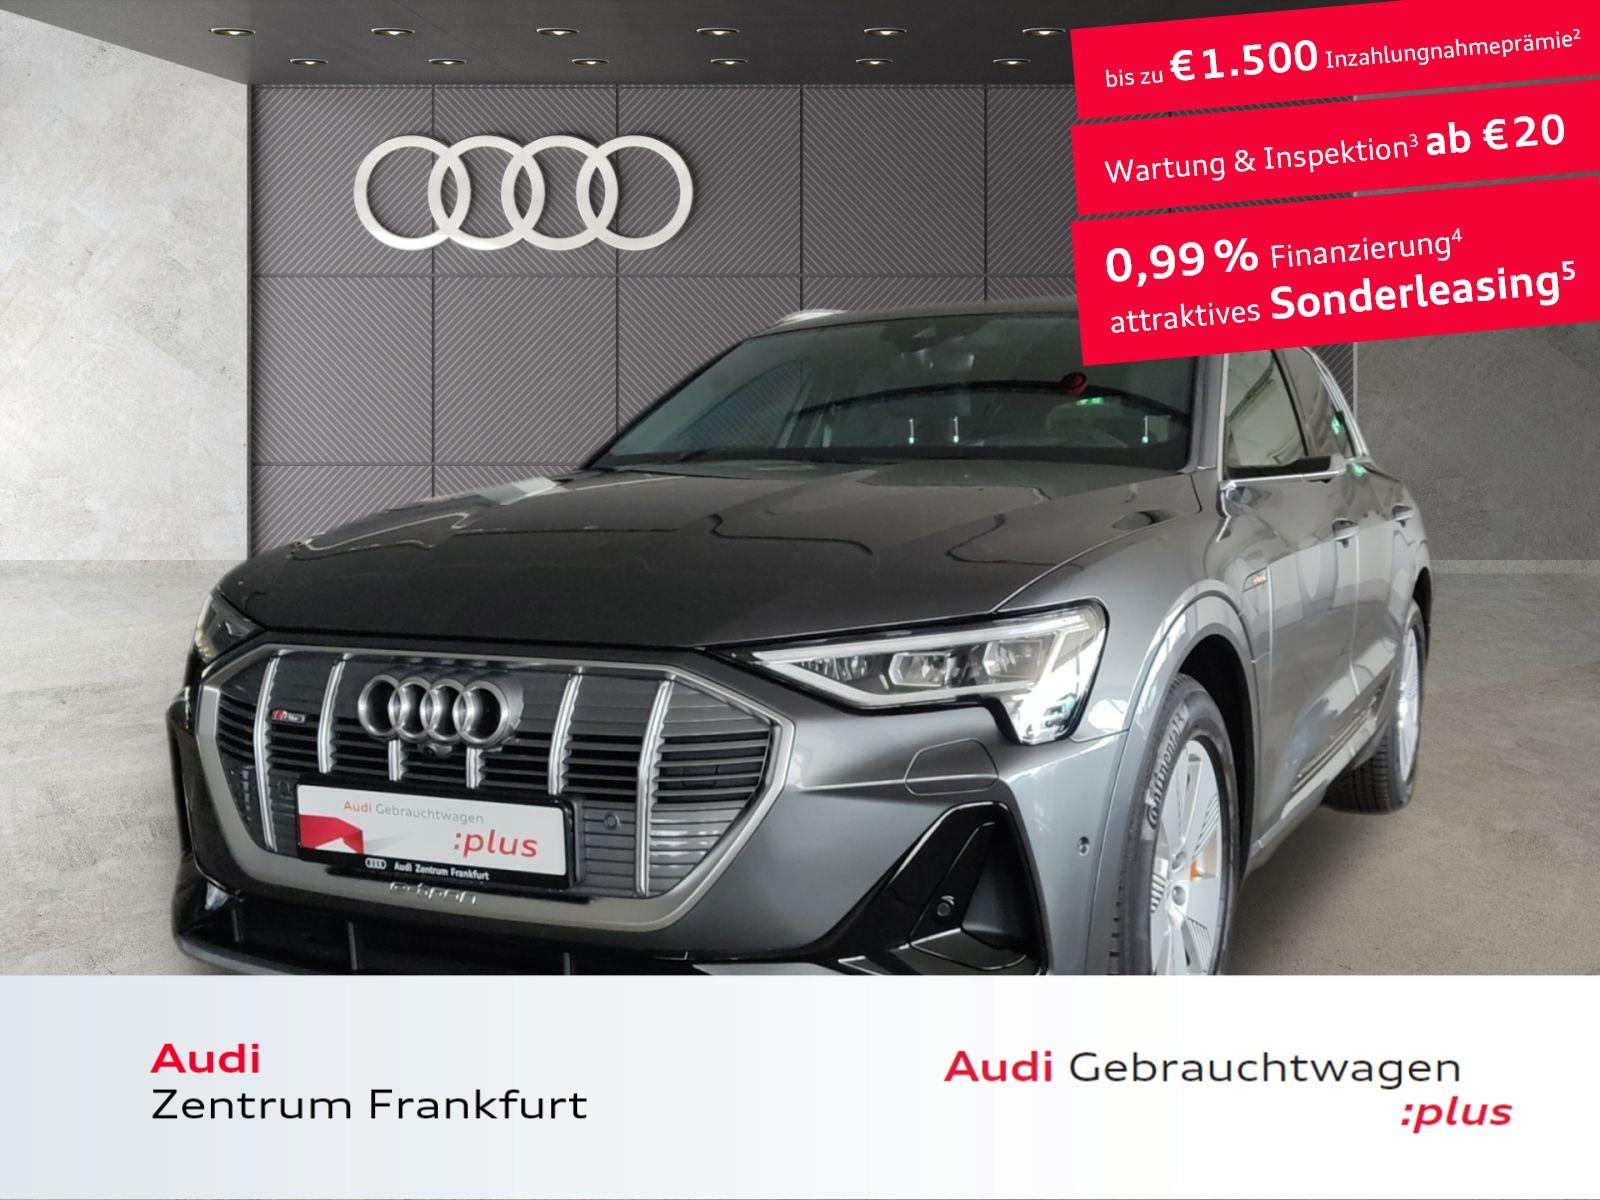 Audi e-tron 55 quattro S line MatrixLED B&O VC HuD DAB Navi, Jahr 2020, Elektro